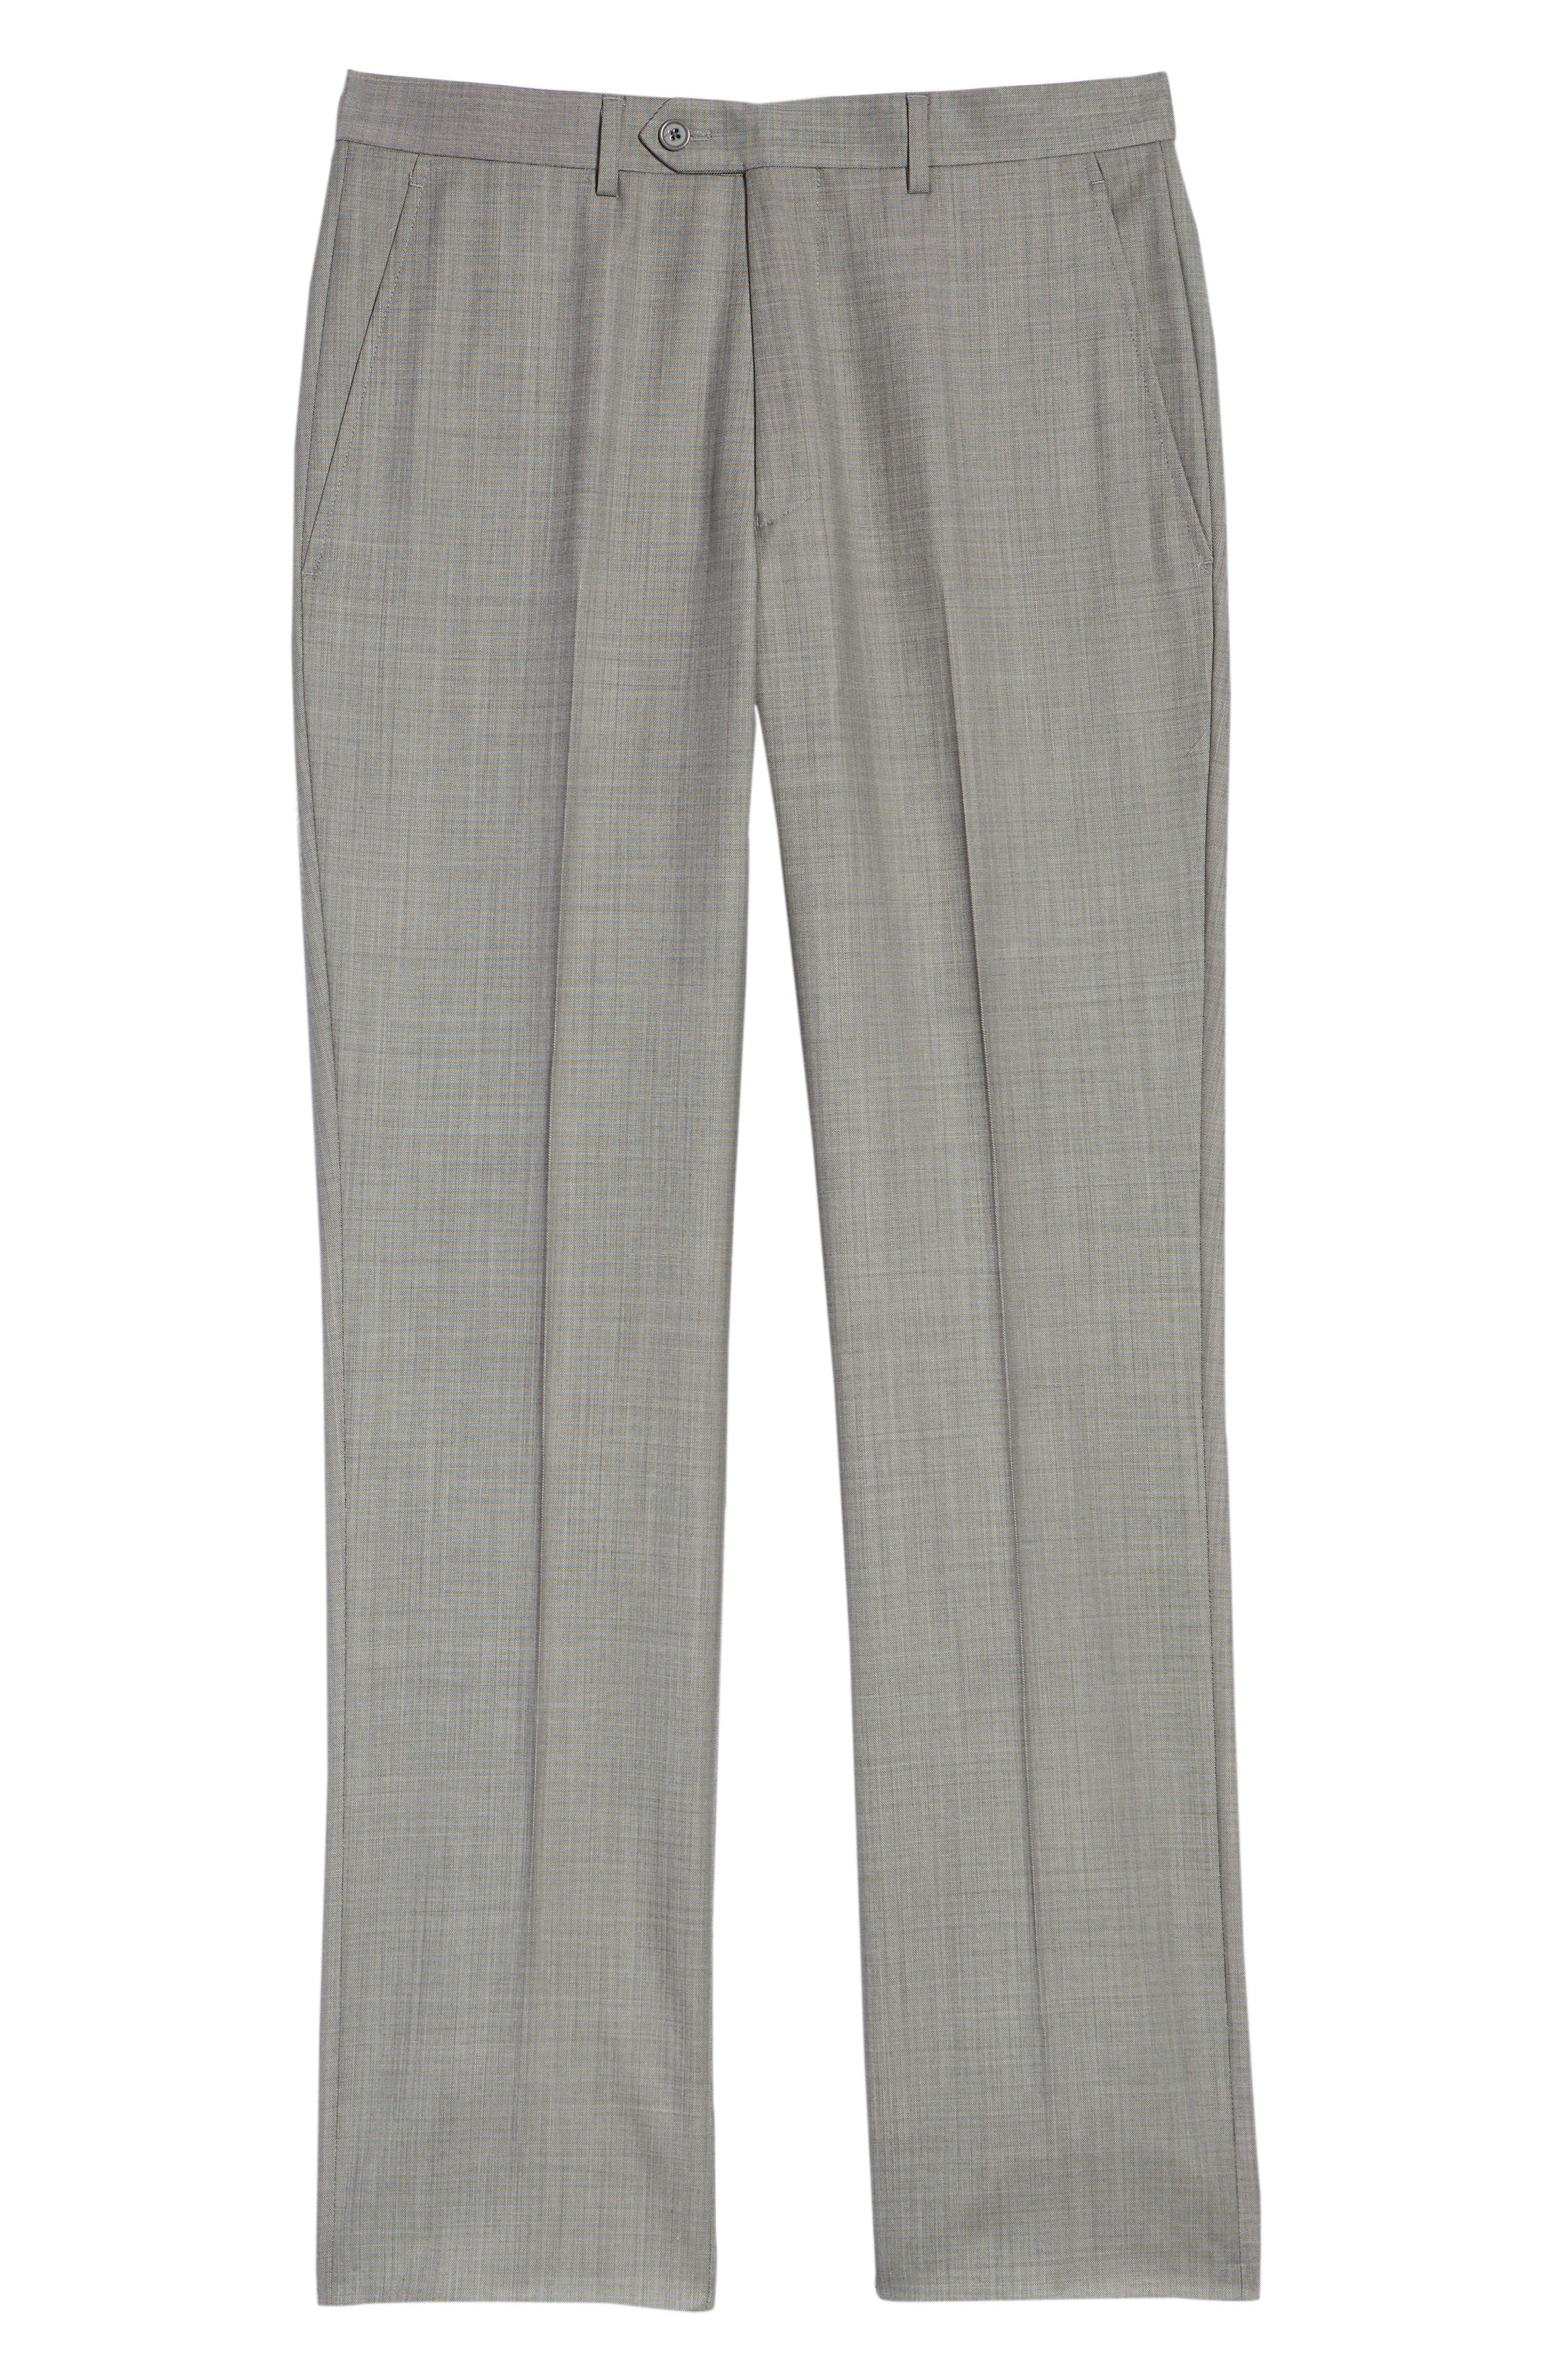 Flat Front Sharkskin Wool Trousers,                             Alternate thumbnail 6, color,                             LIGHT GREY